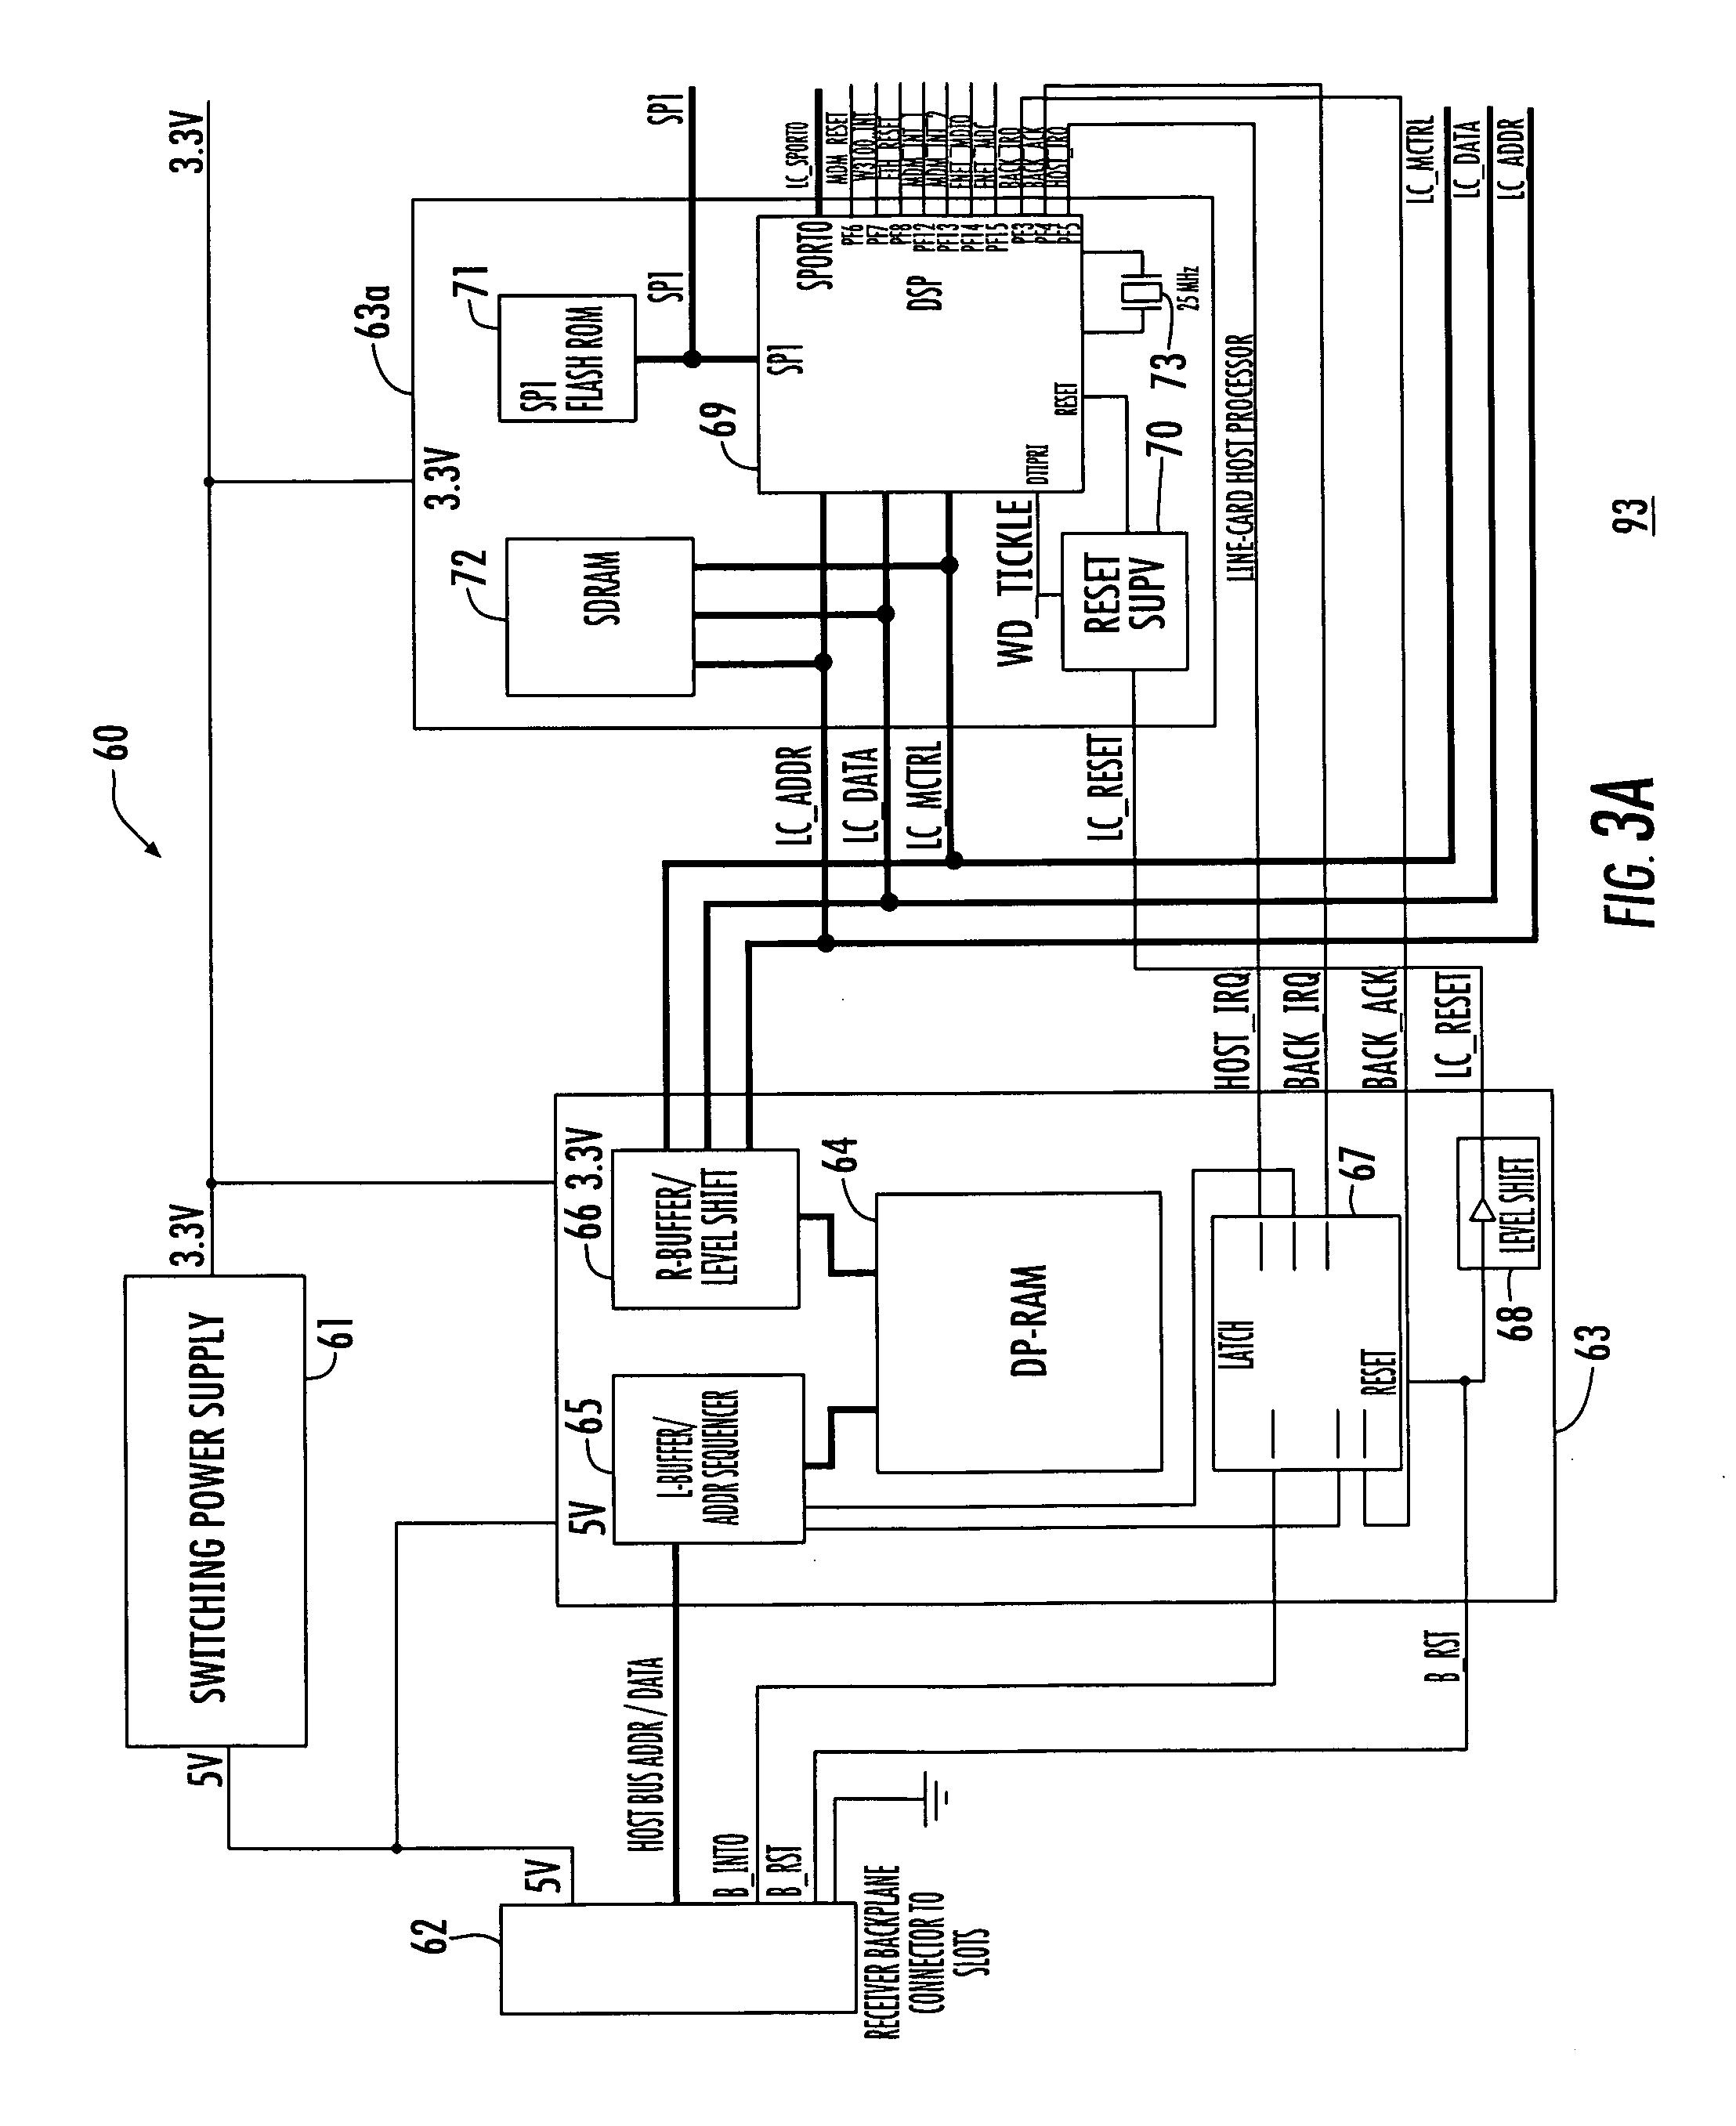 US20090058630A1 20090305 D00004?resize=665%2C814 simplex fire alarm wiring diagrams motor control ladder diagrams att wiring diagram at eliteediting.co